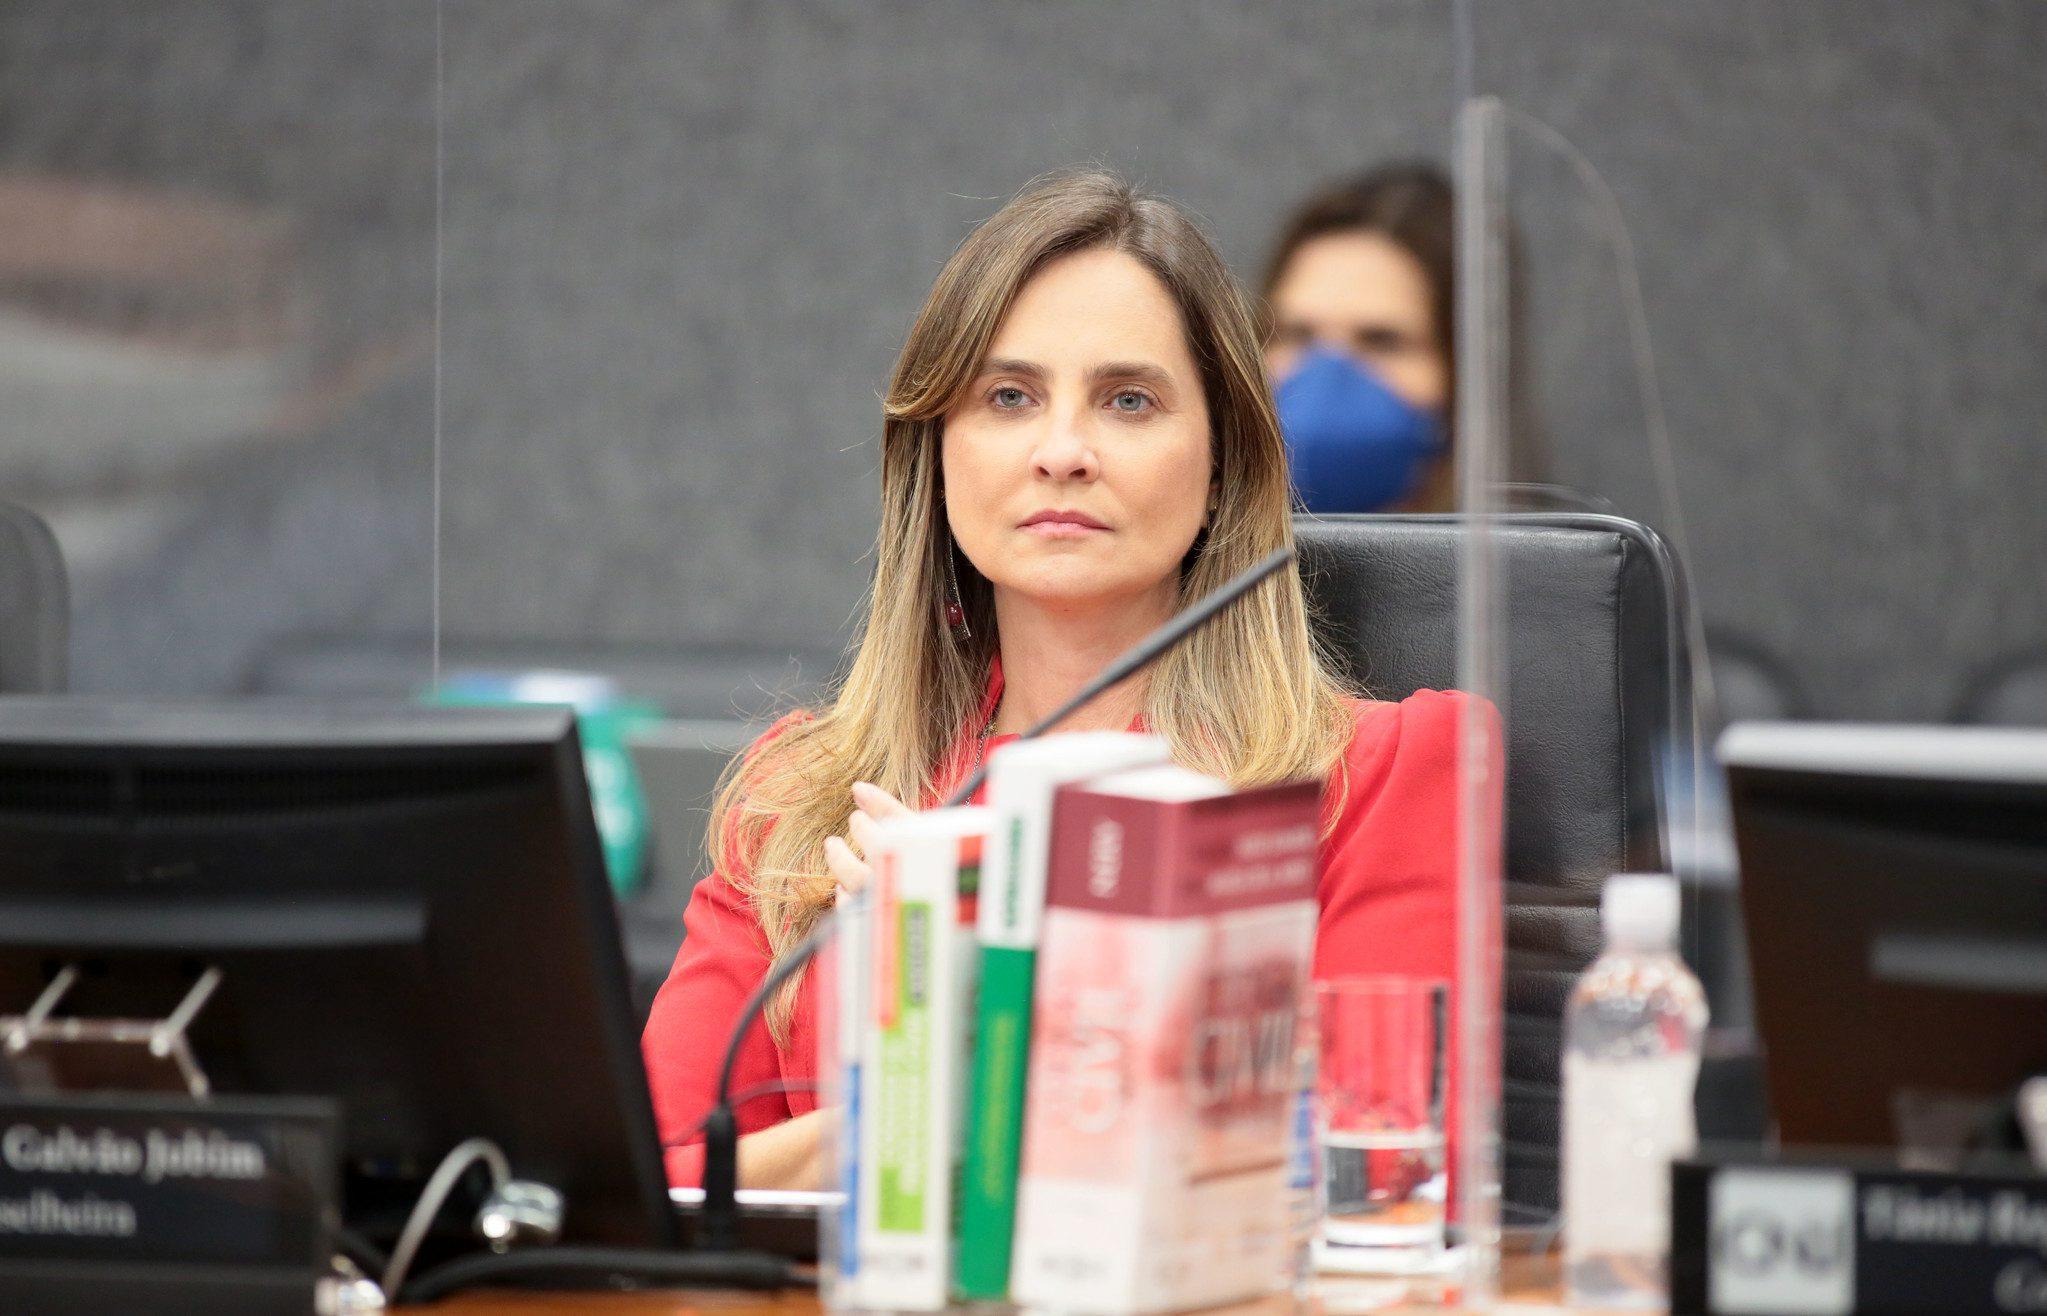 Candice Jobim